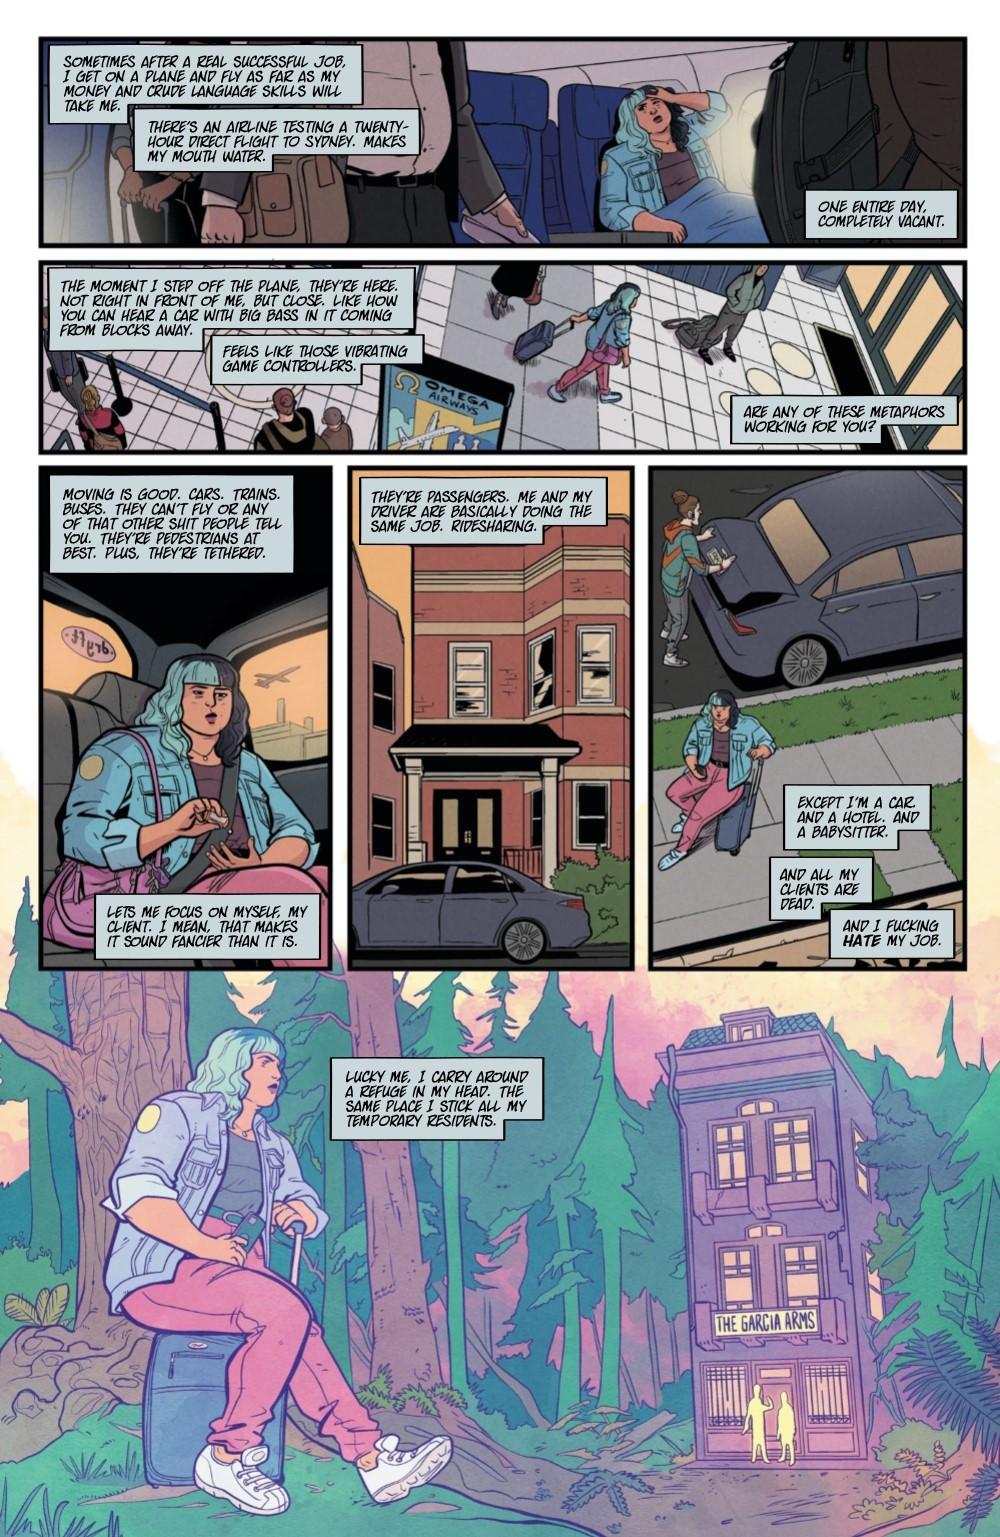 DIRTBAGRAPTURE1-MARKETING-04 ComicList Previews: DIRTBAG RAPTURE #1